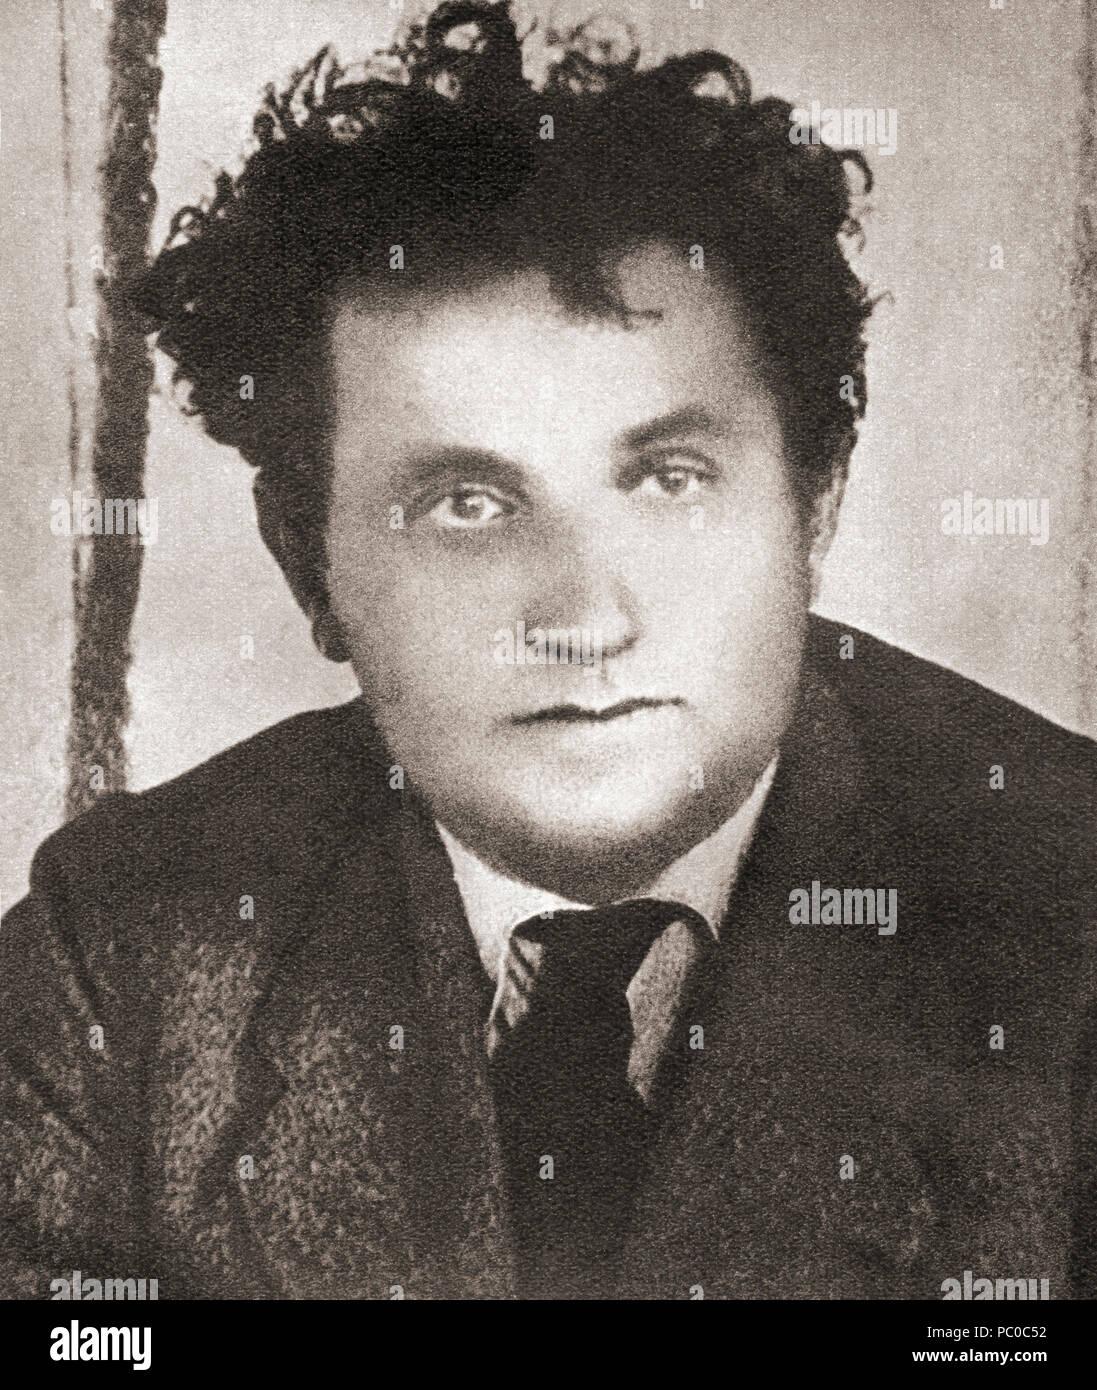 Grigory Yevseevich Zinoviev, 1883 – 1936, born Hirsch Apfelbaum, aka Ovsei-Gershon Aronovich Radomyslsky.  Bolshevik revolutionary and a Soviet Communist politician.  From These Tremendous Years, published 1938. - Stock Image